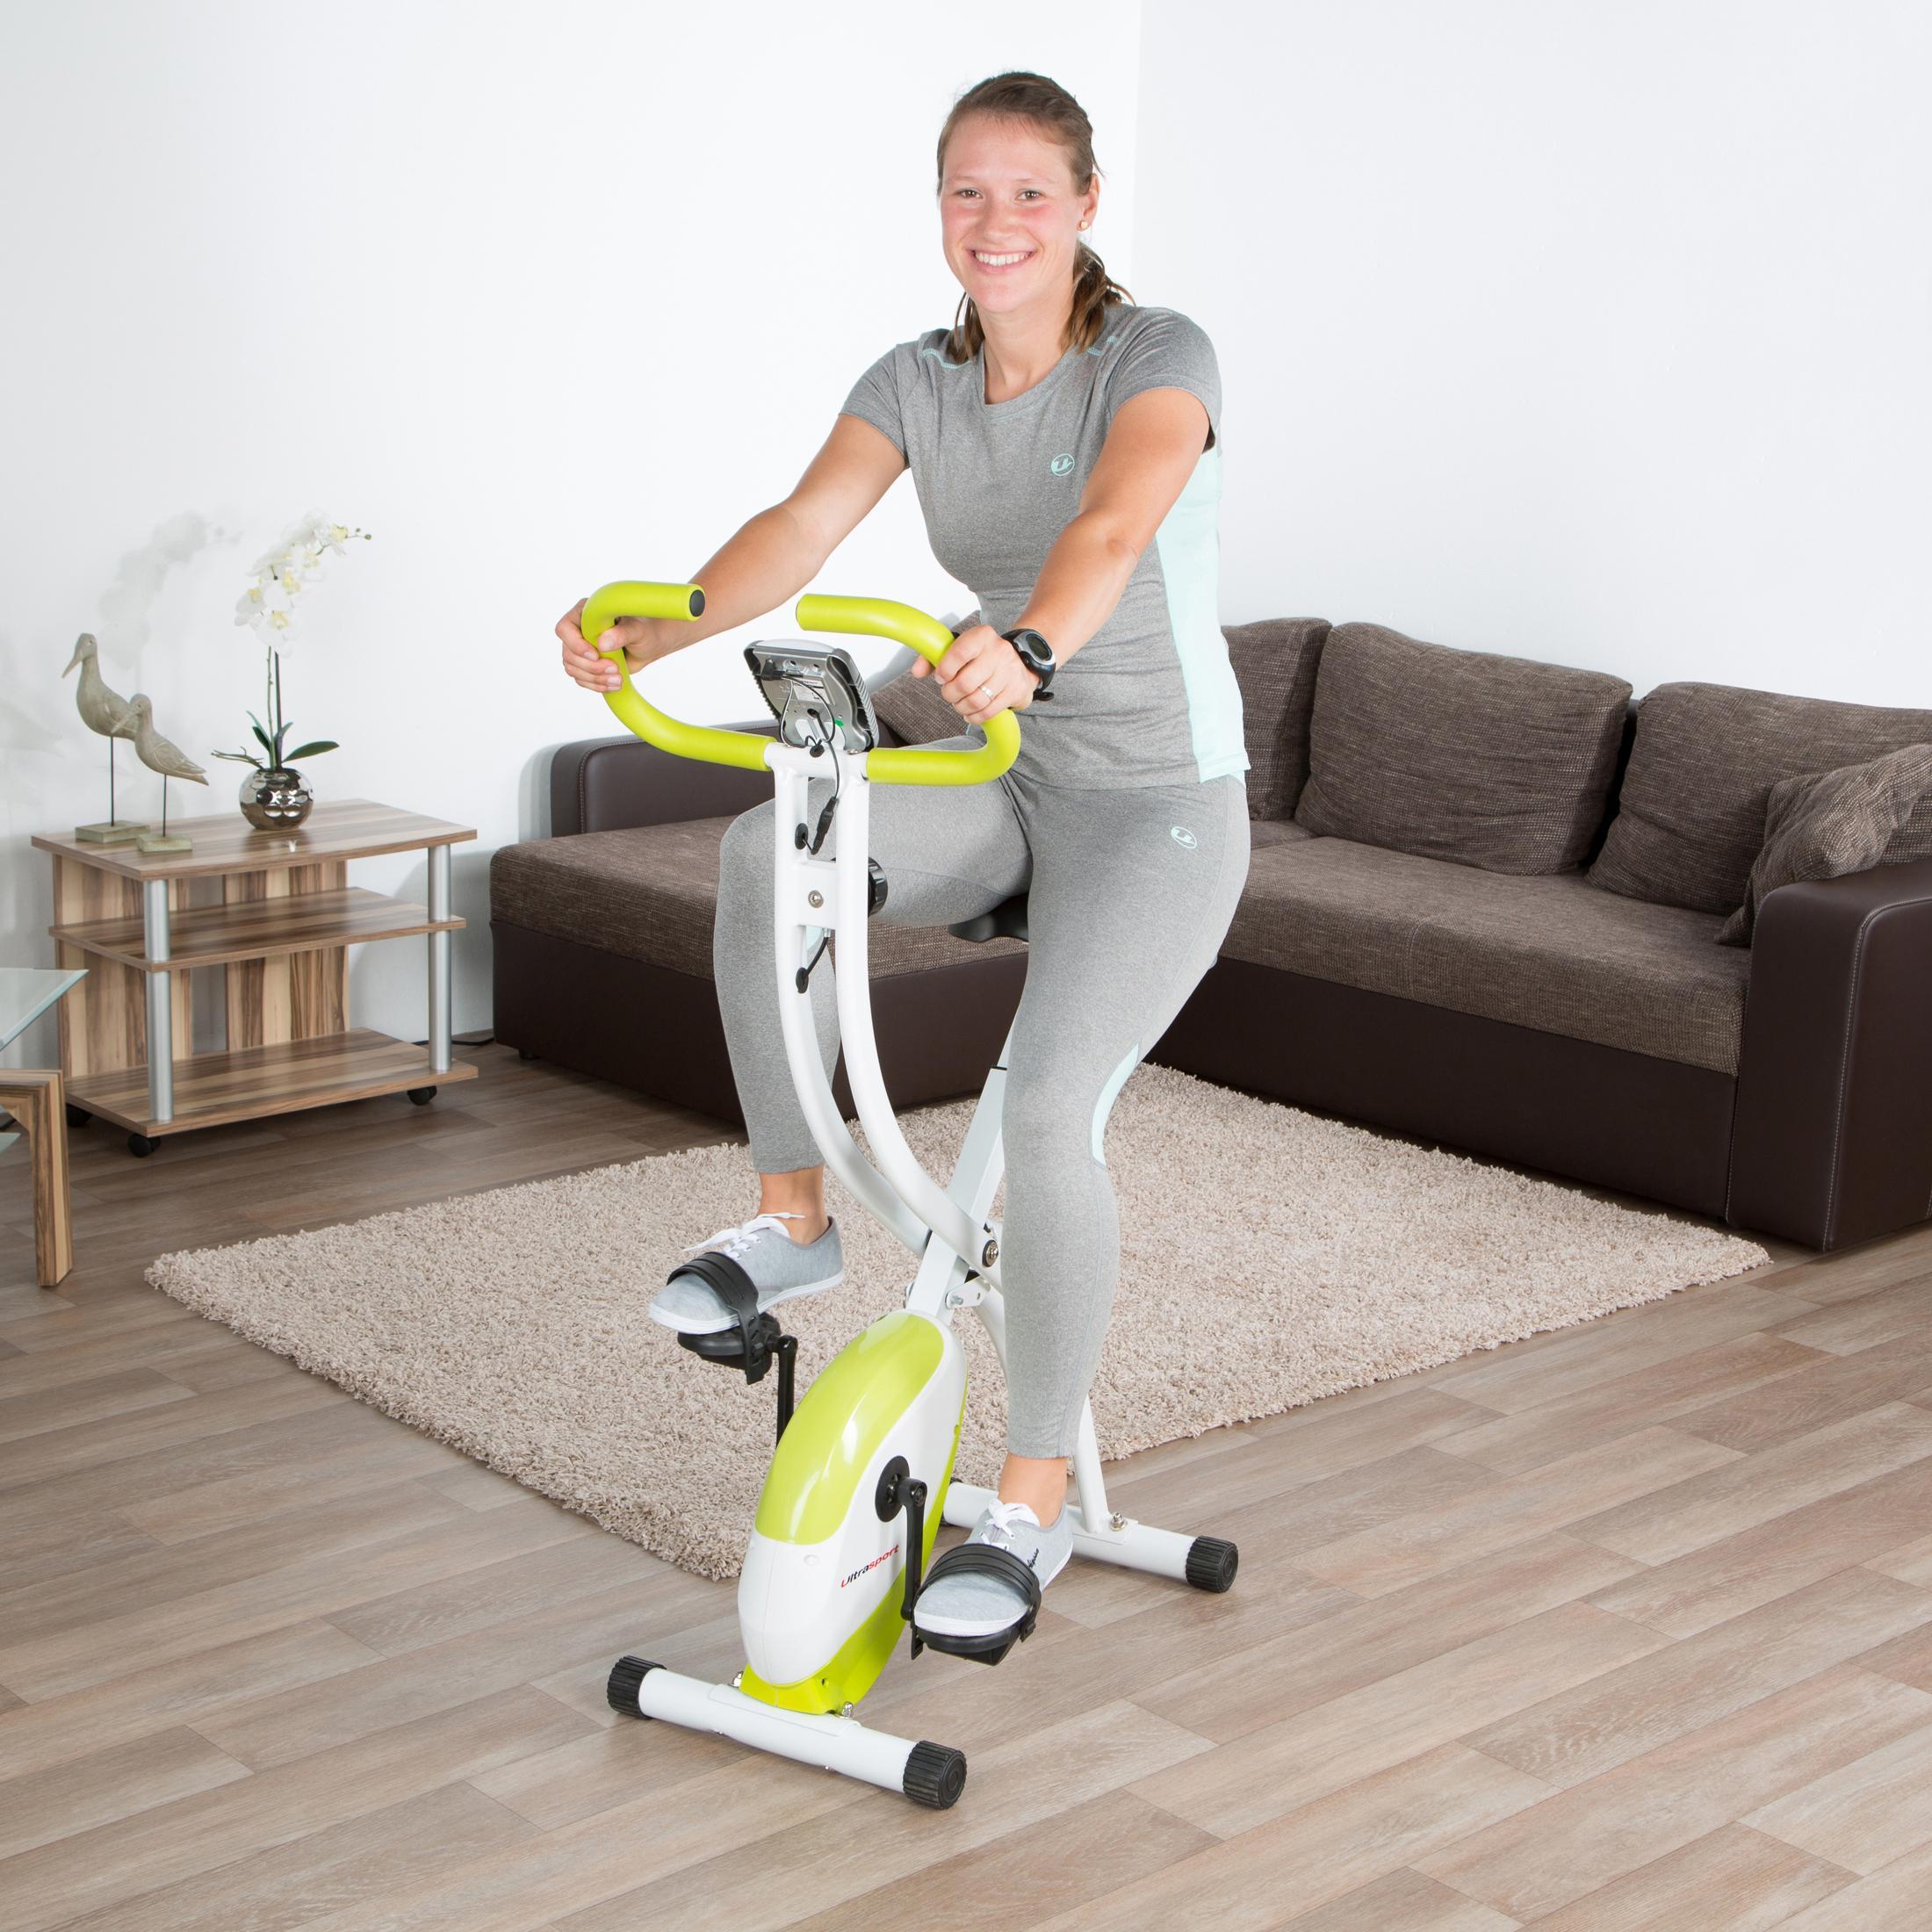 Ultrasport Heimtrainer F-Bike 150 / 200B: Amazon.de: Sport